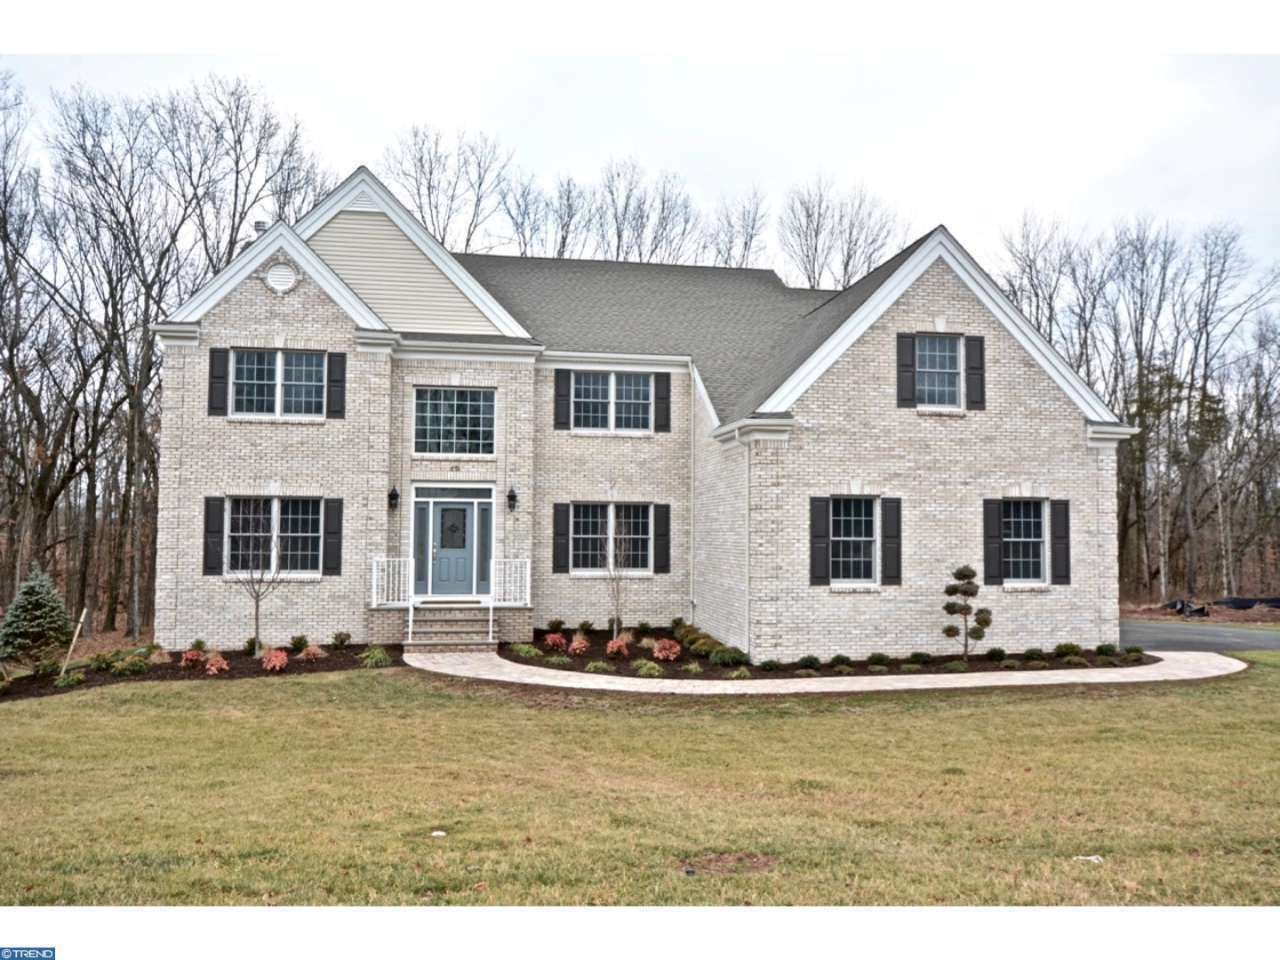 19 Stone House Ct, Montgomery, NJ - USA (photo 1)